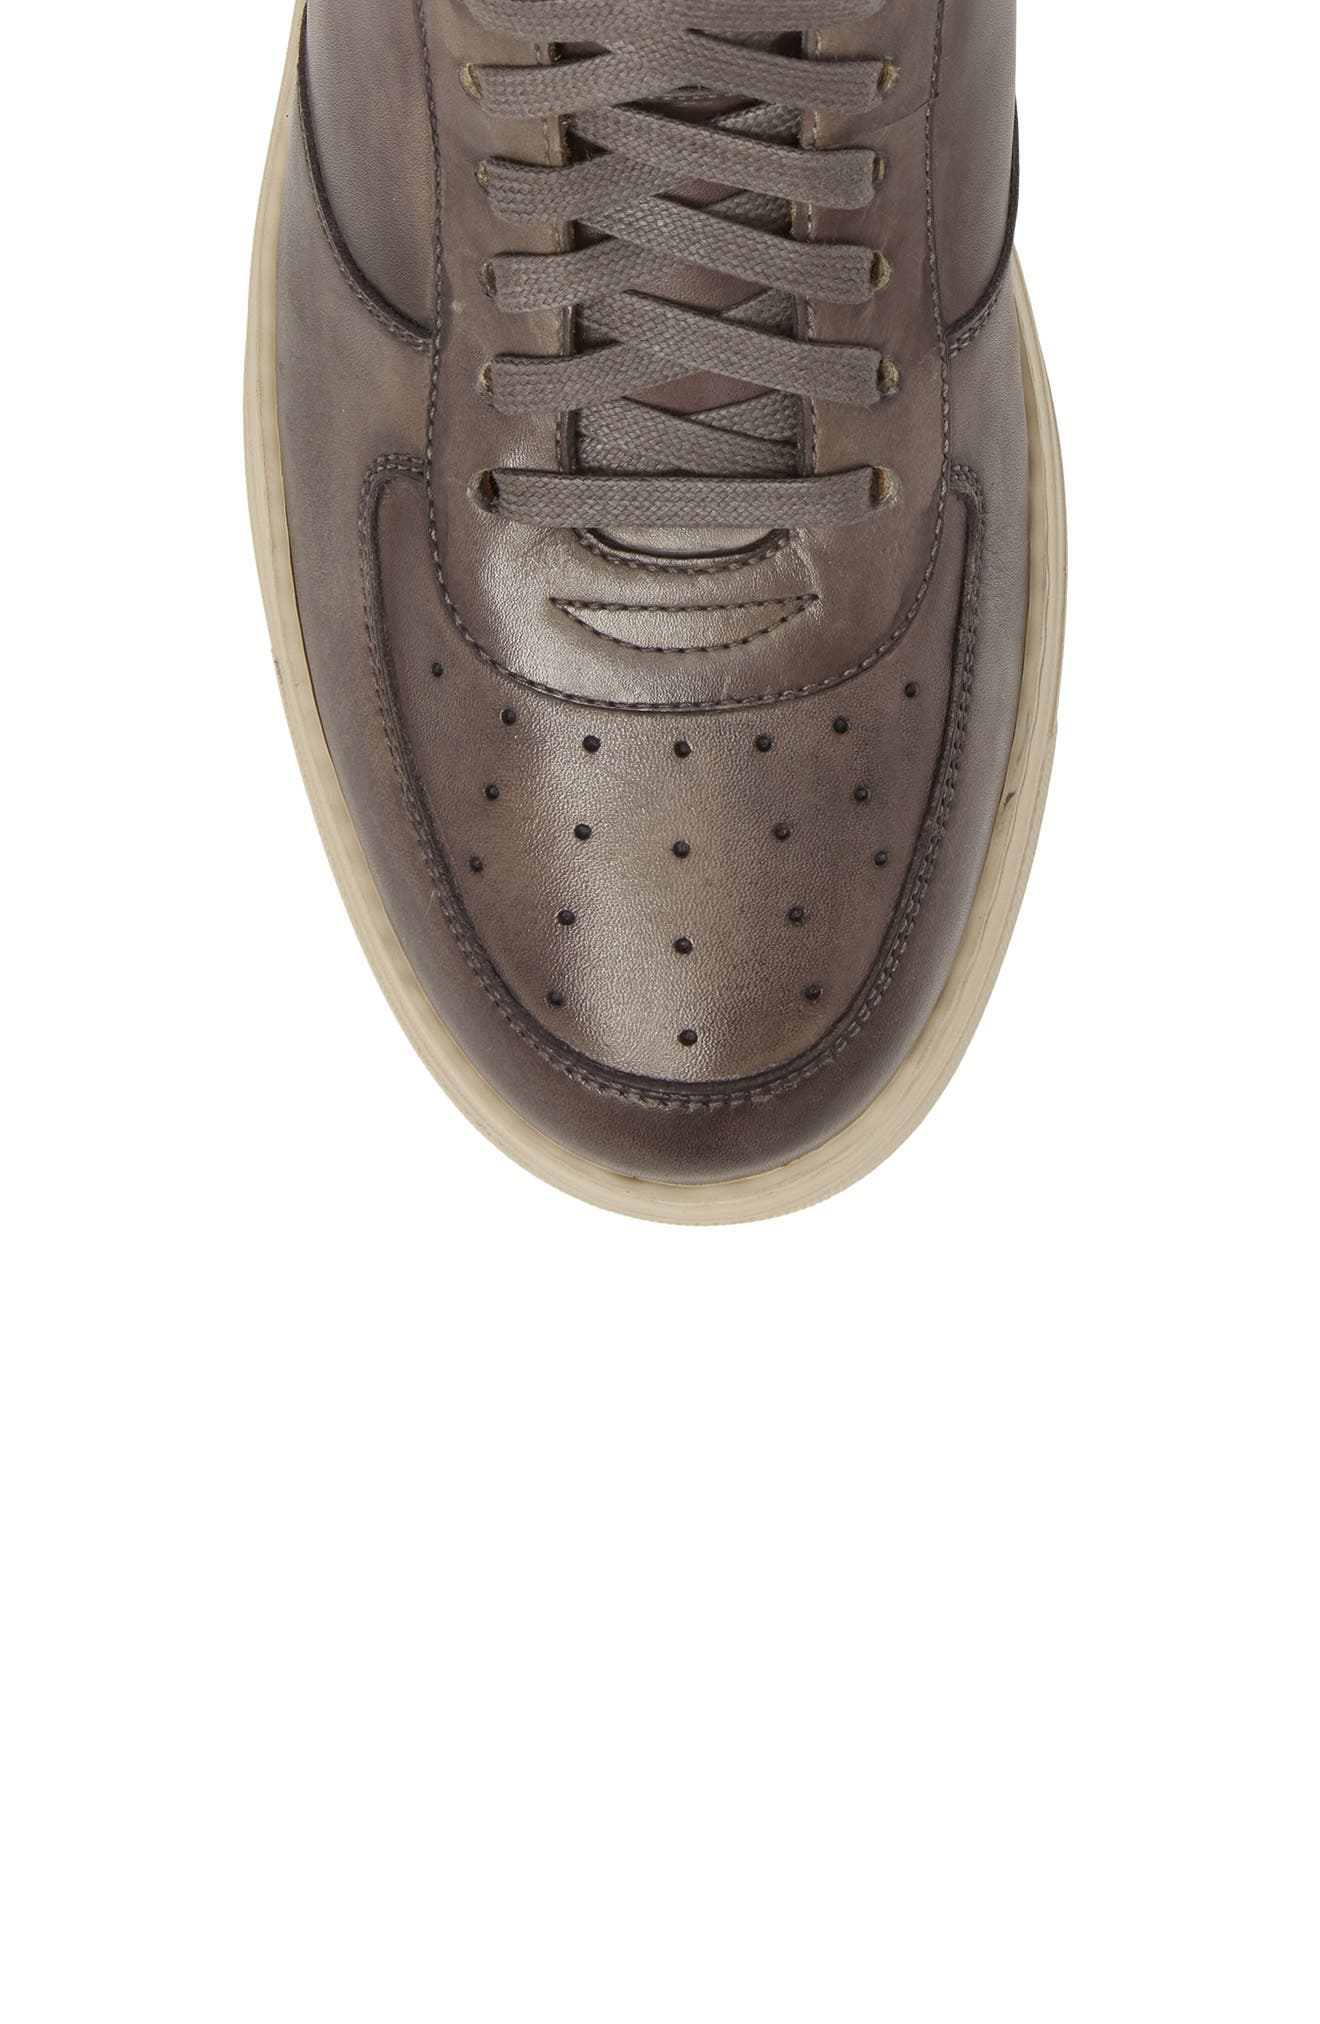 Varro Hi Top Lace Up Sneaker,                             Alternate thumbnail 5, color,                             021